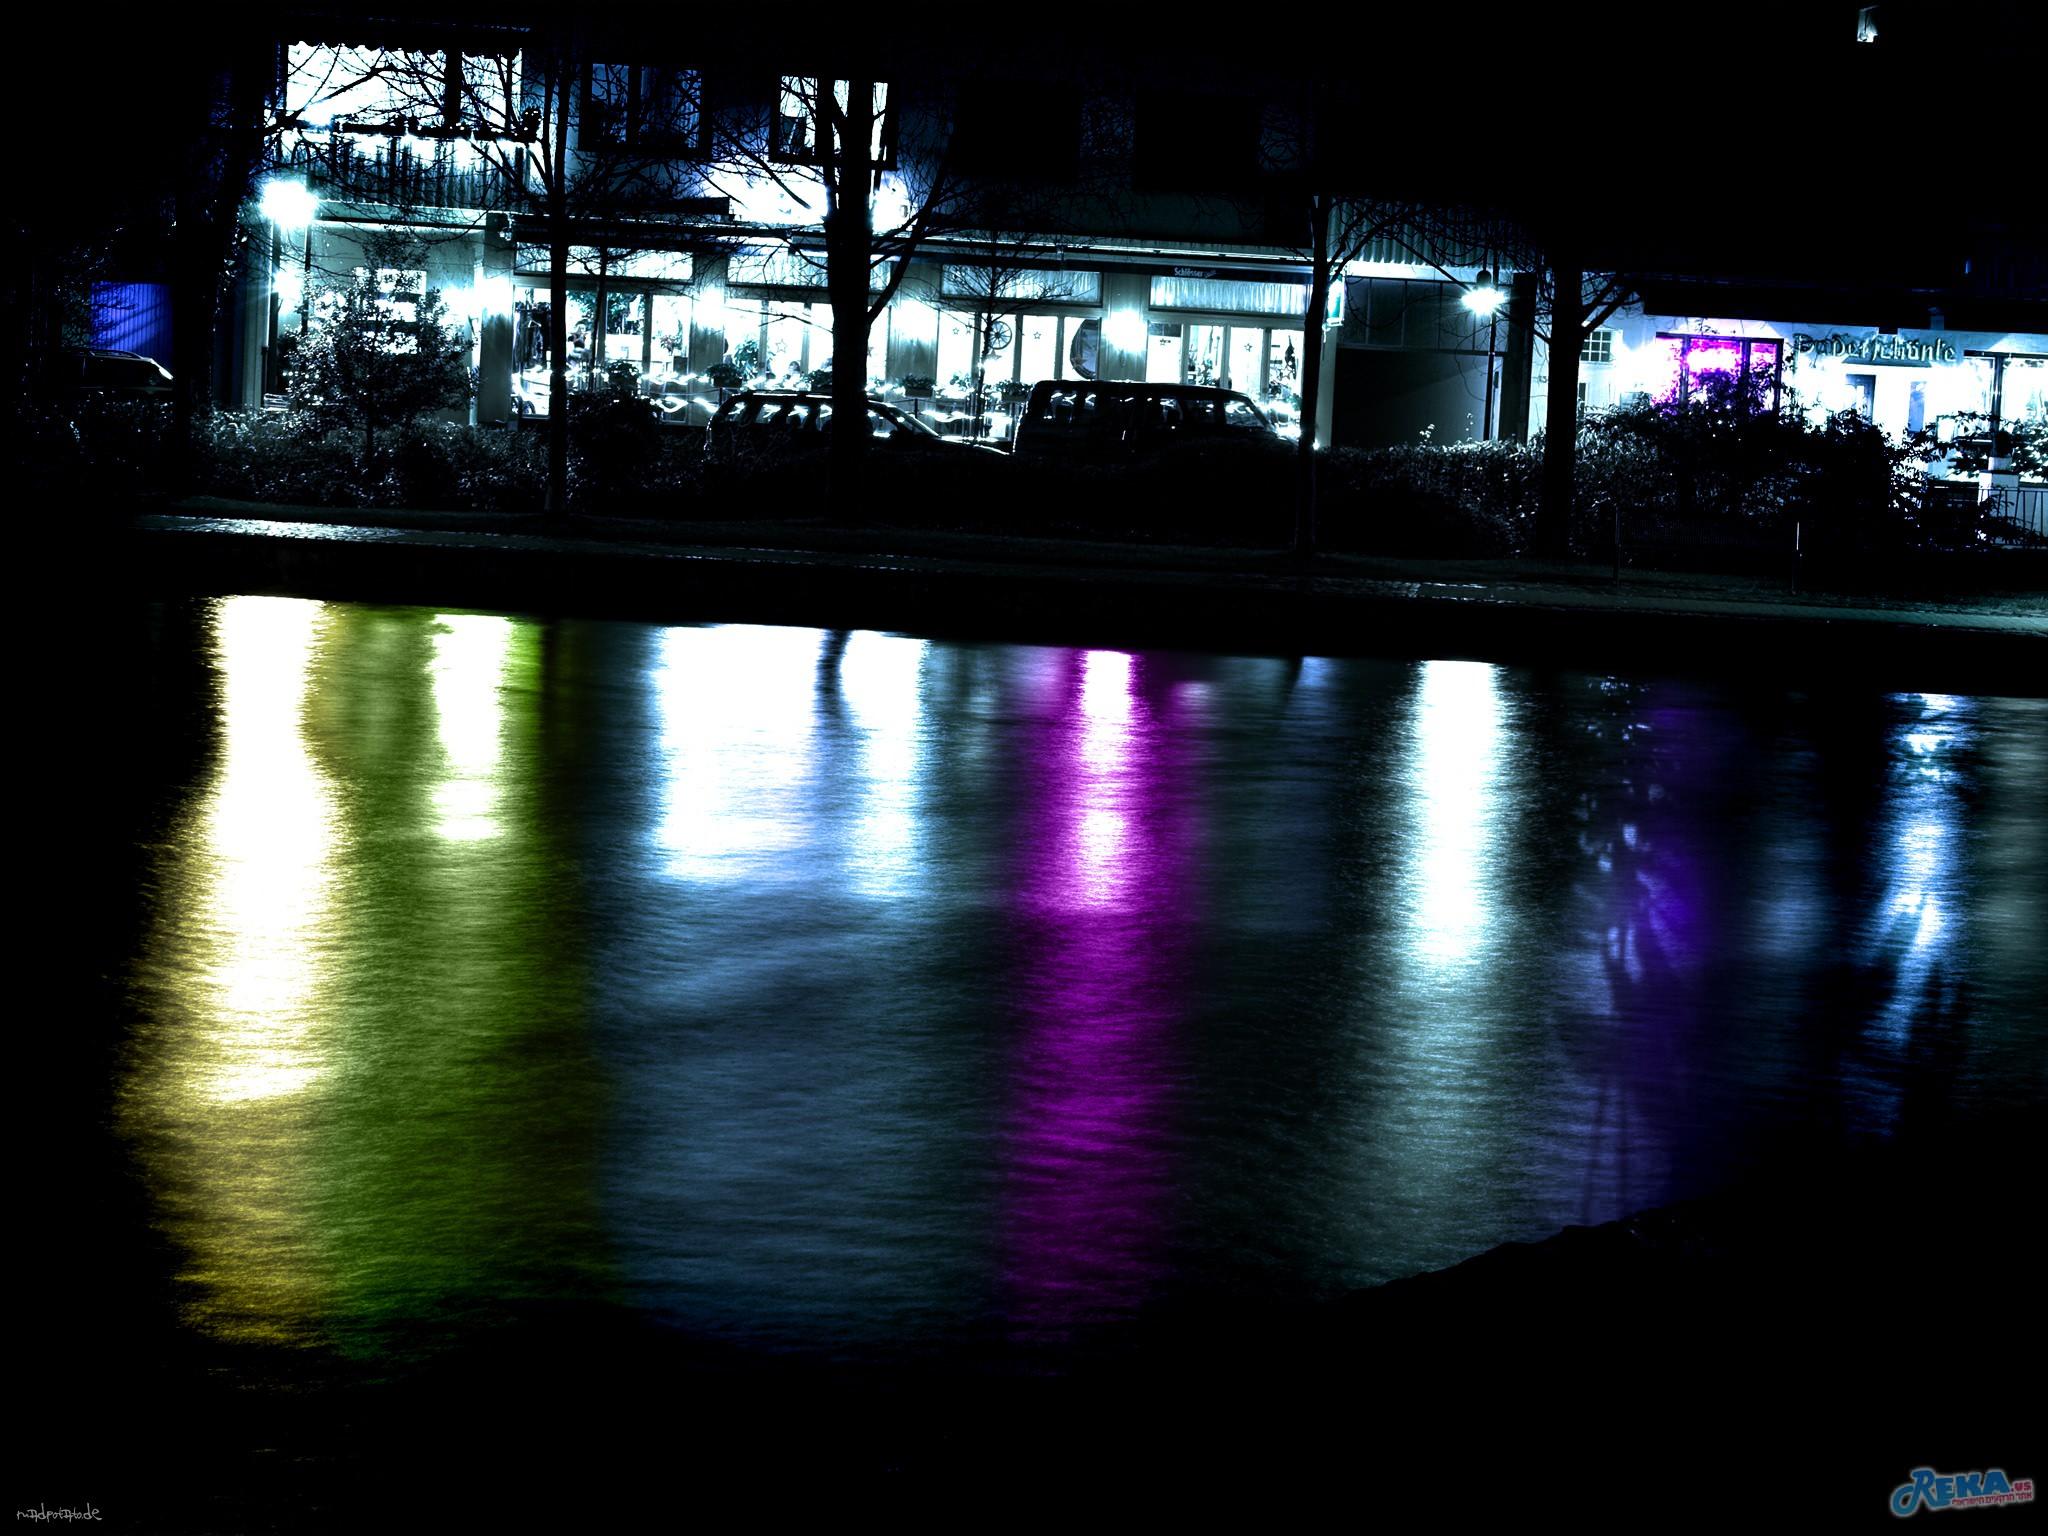 NightShot_4_2048.jpg